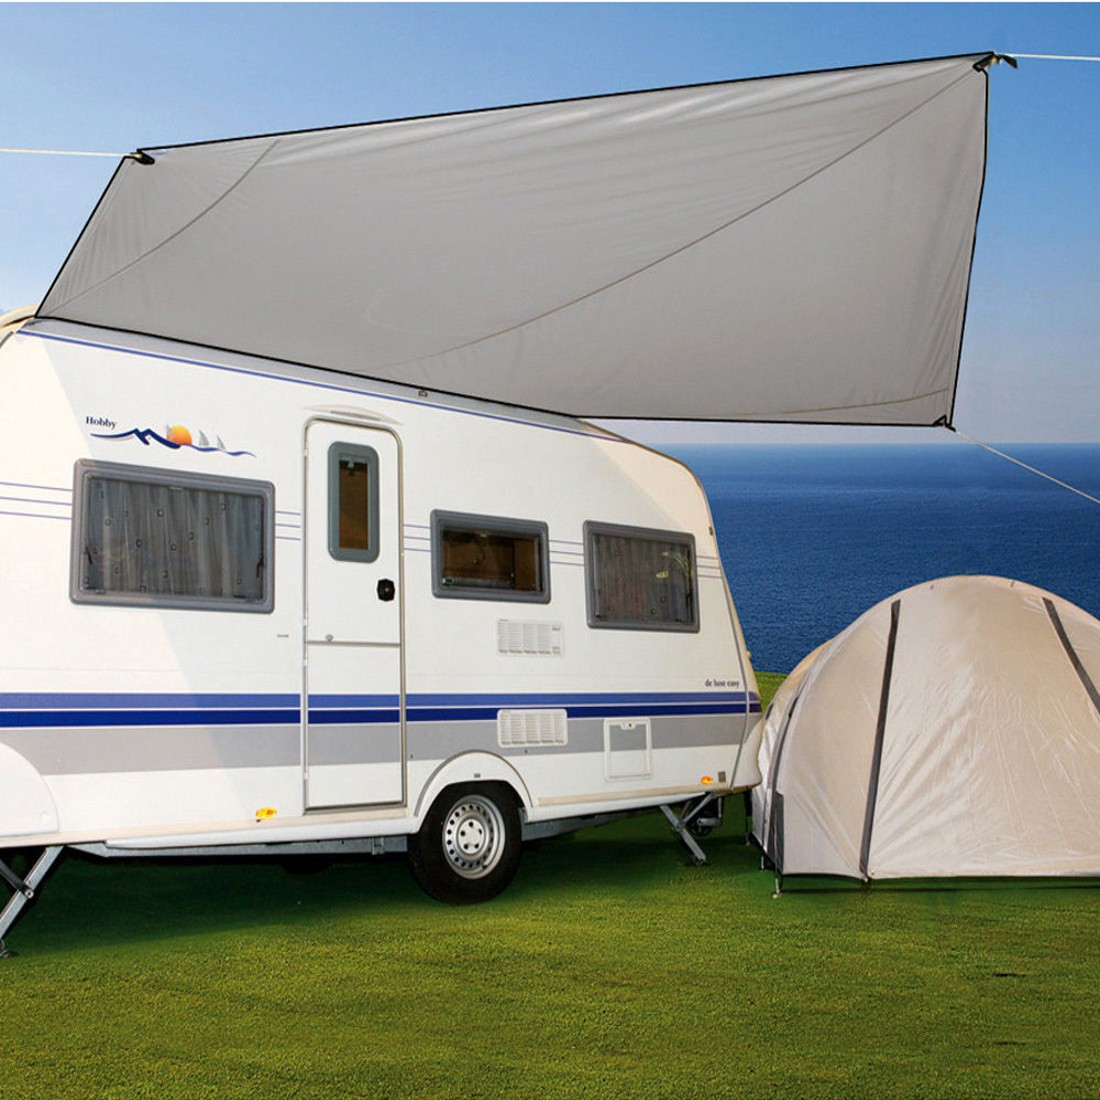 bo camp tarp caravan sonnensegel f r wohnwagen 450x350cm